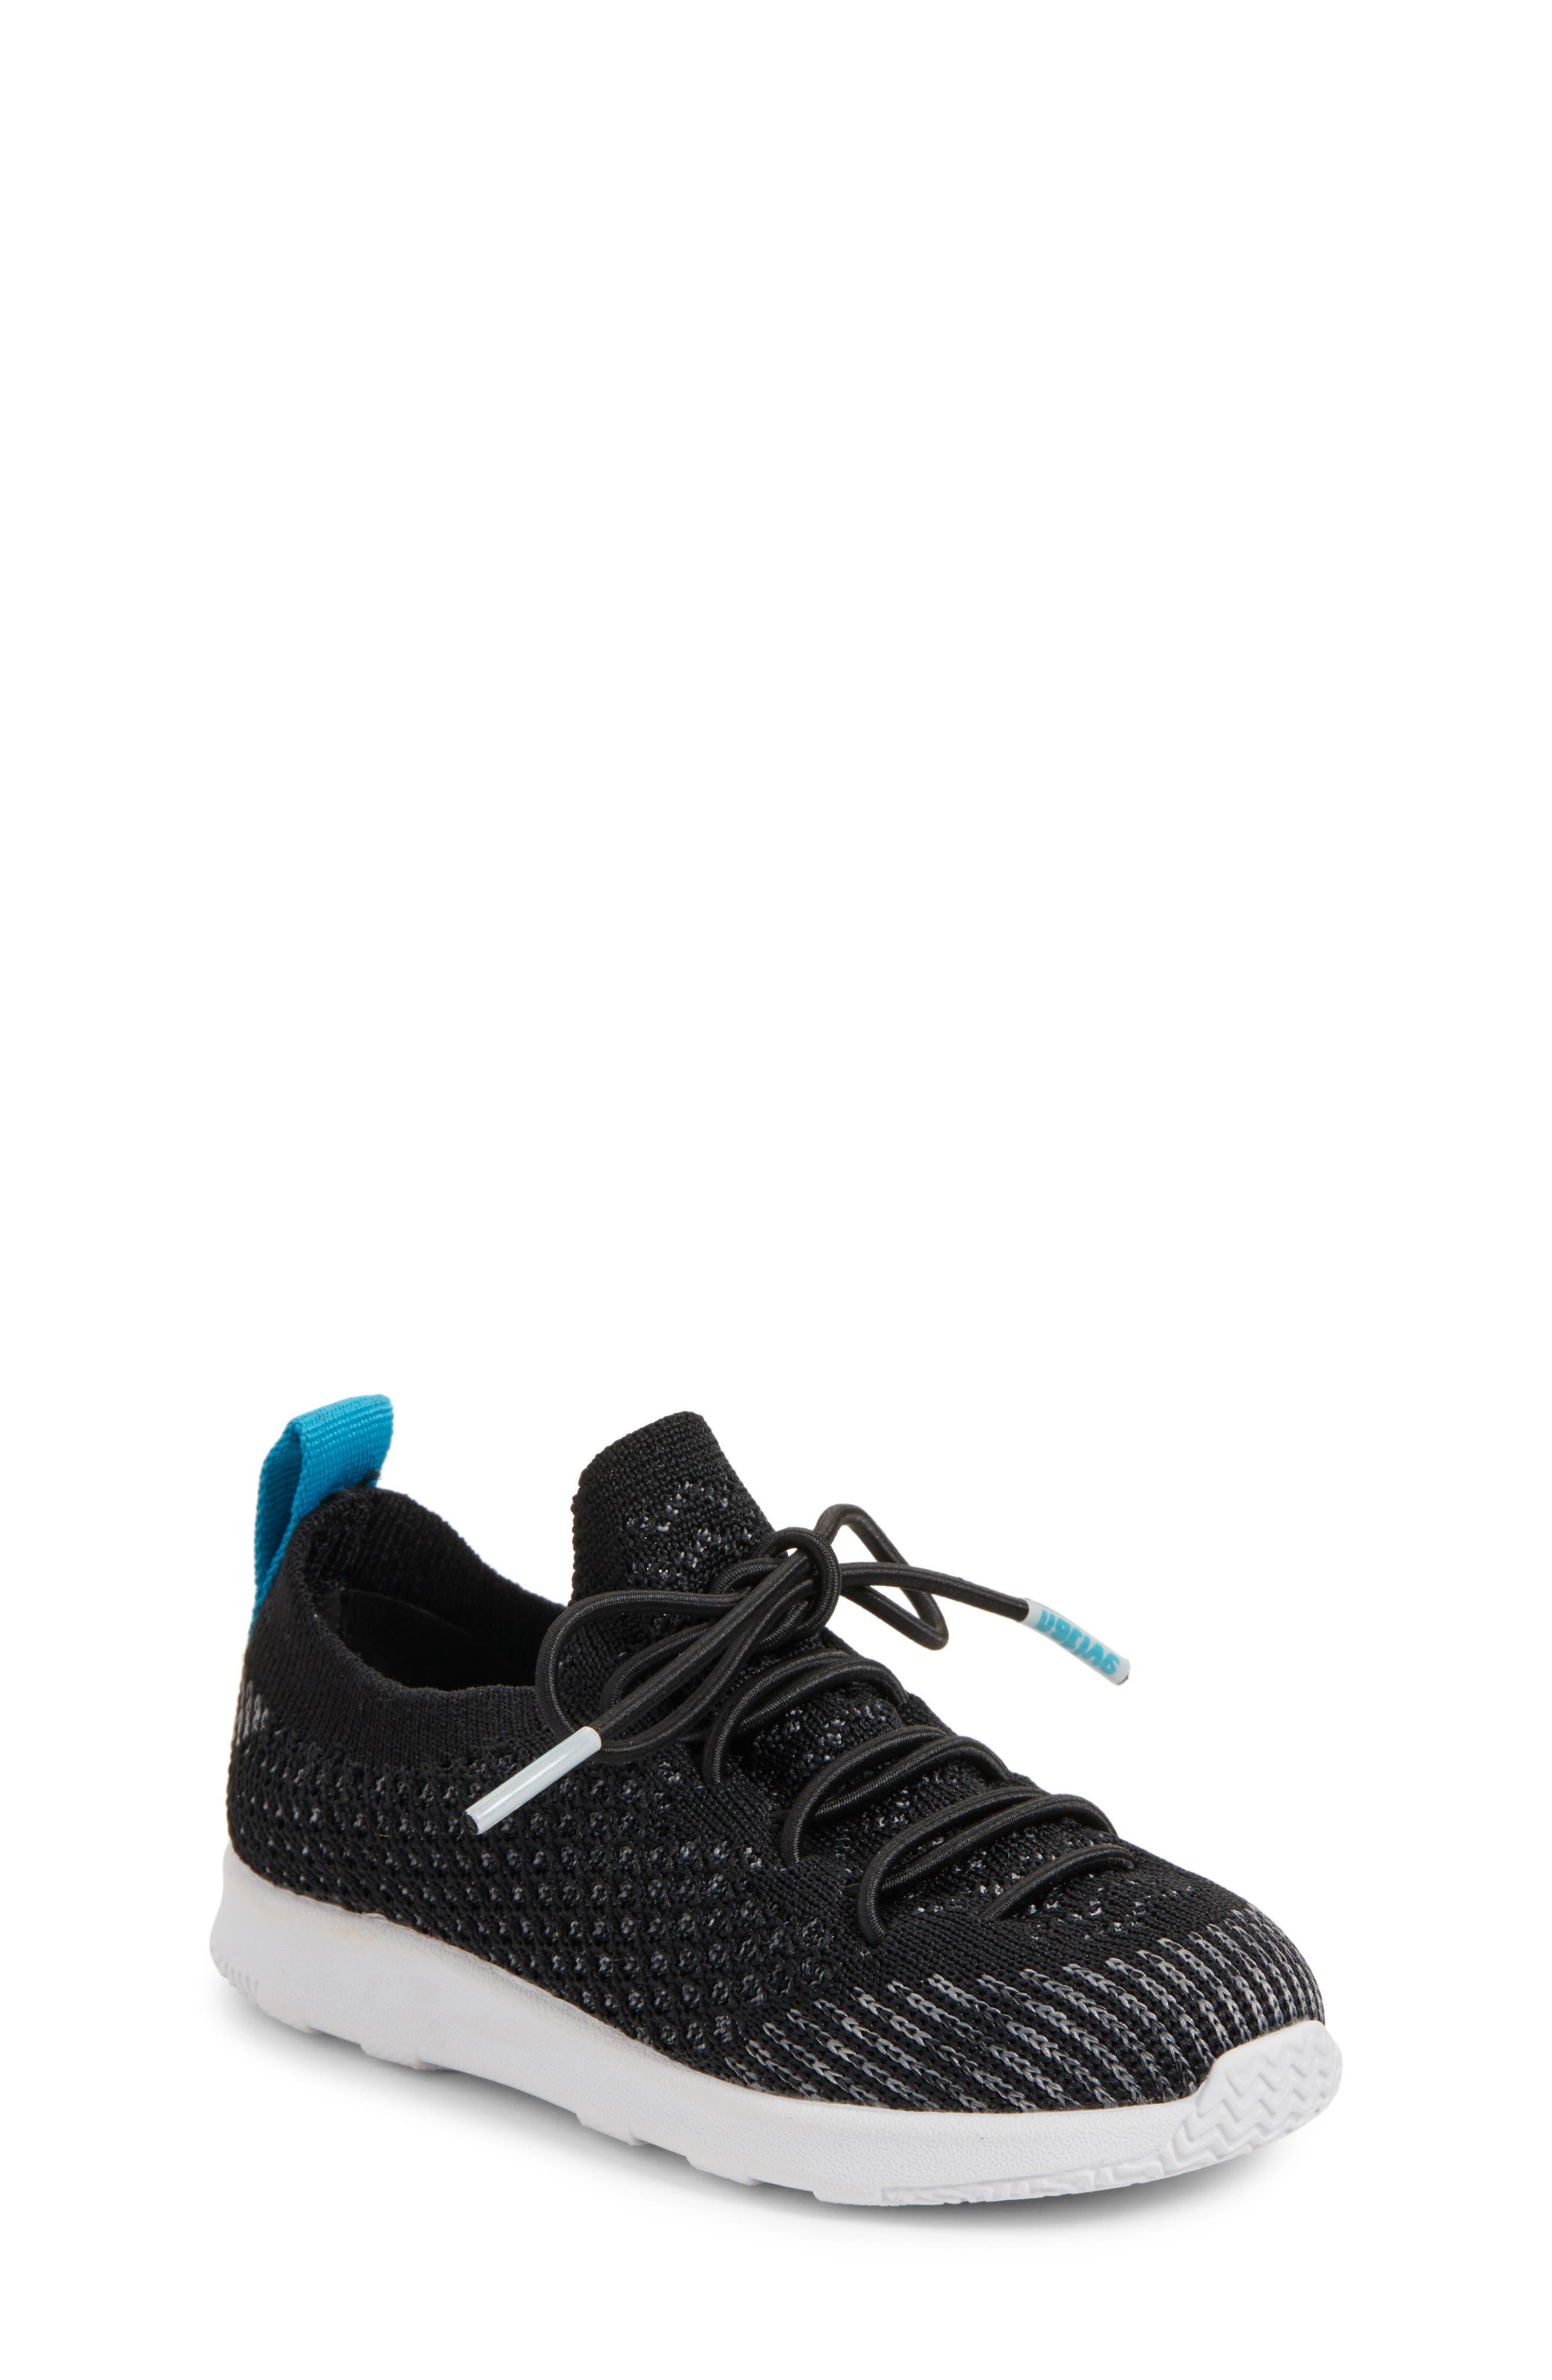 AP Mercury LiteKnit Sneaker,                             Main thumbnail 1, color,                             004